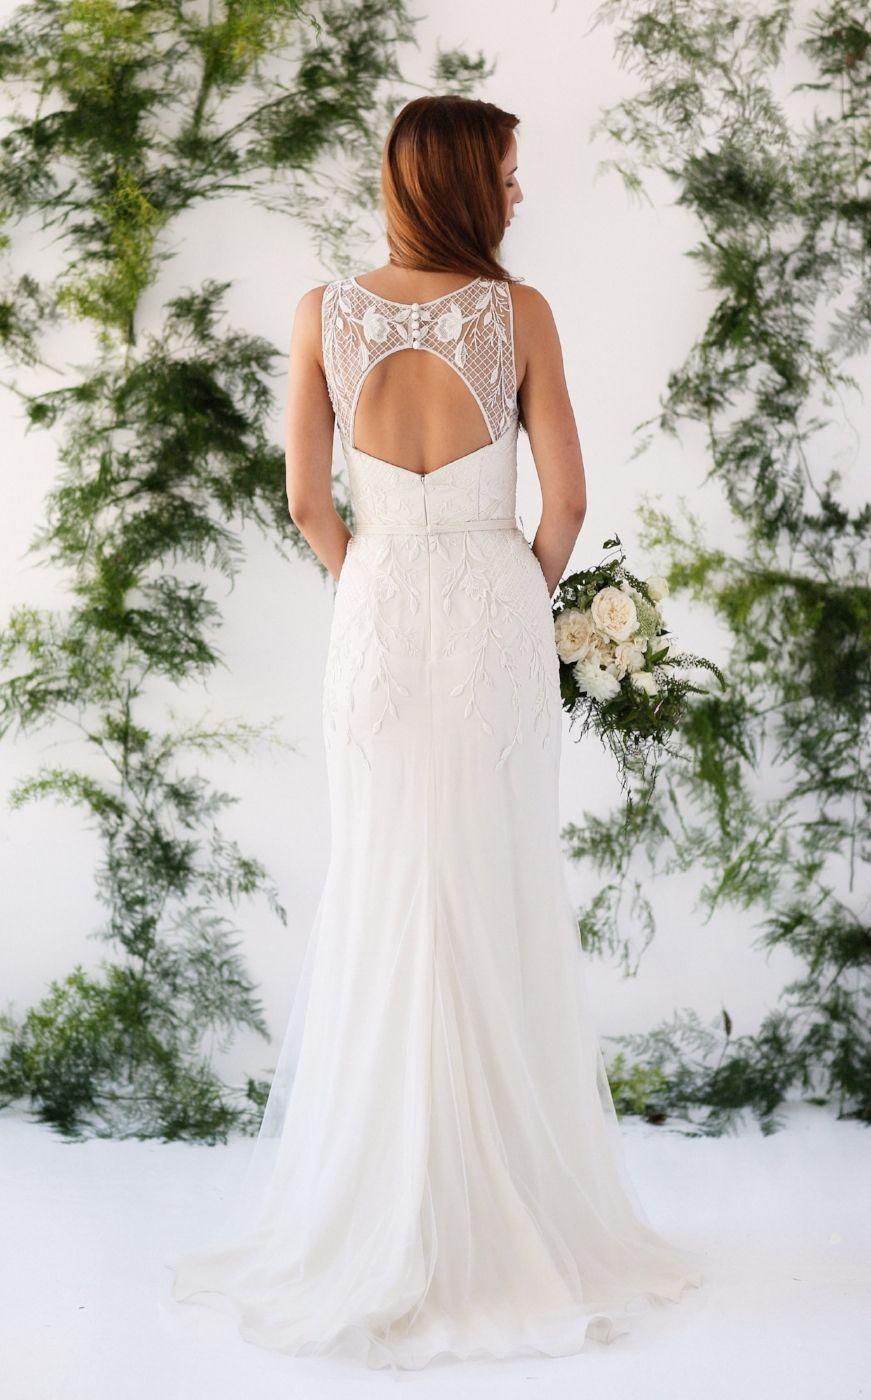 Marina semone wedding dress tess dress boho bride romantic bride